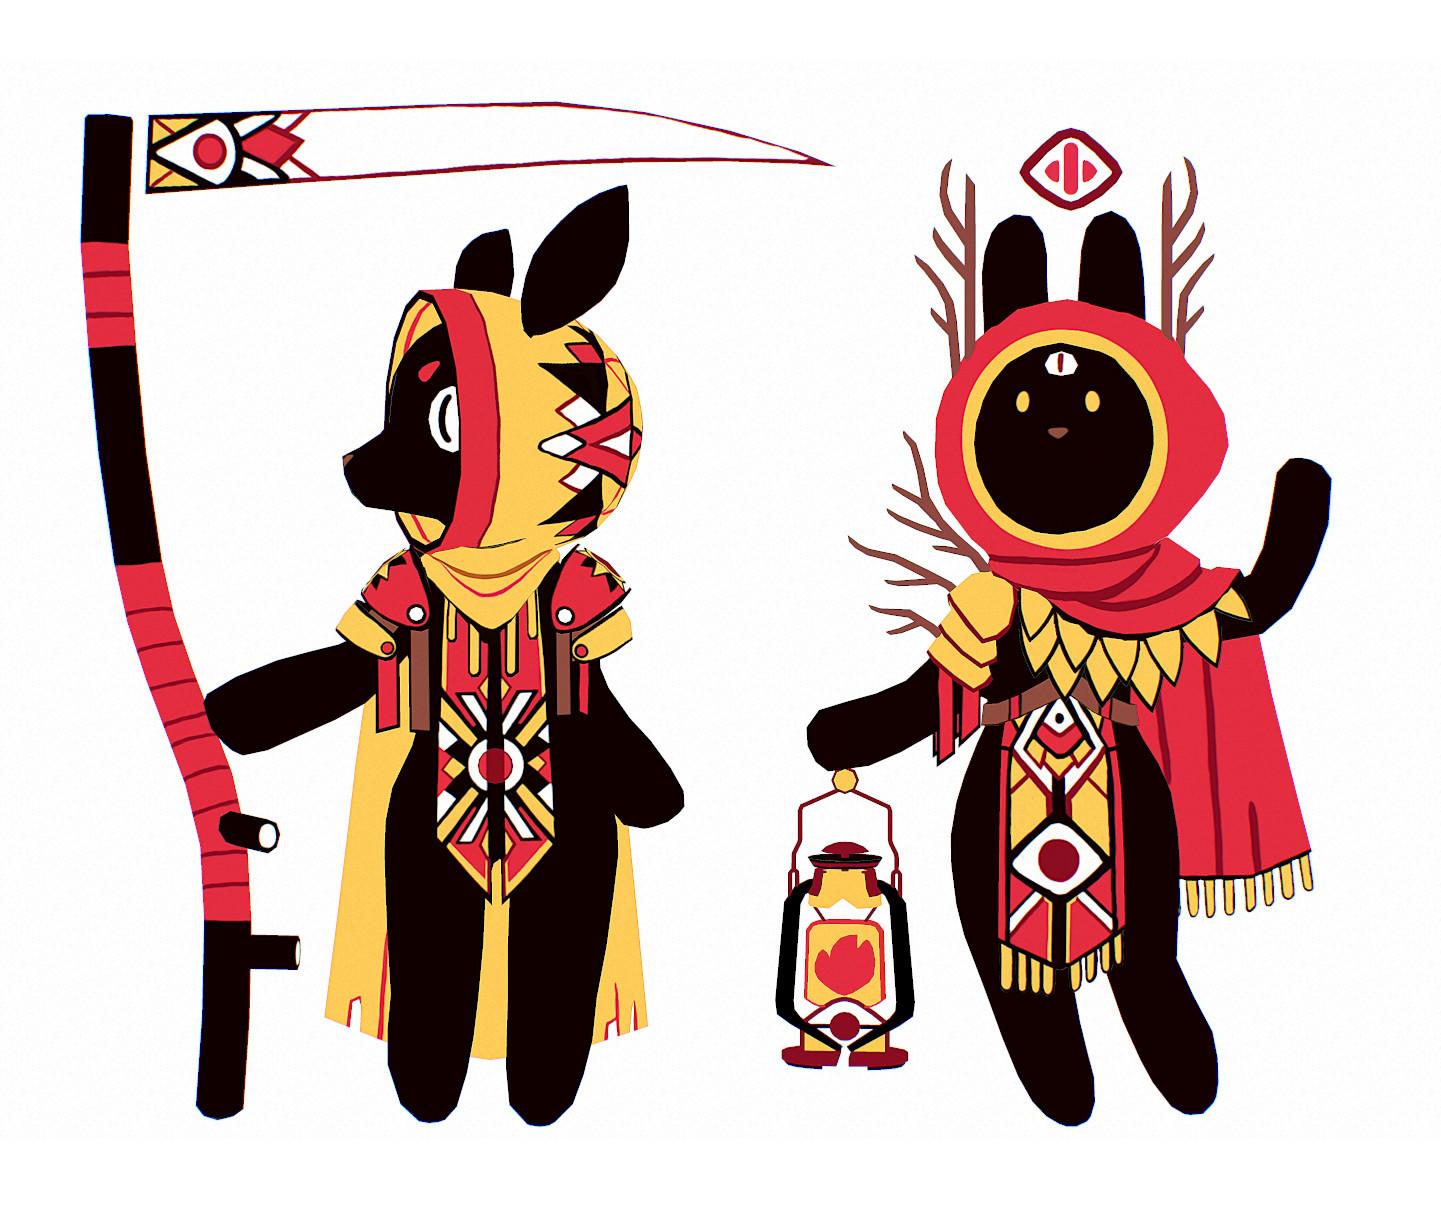 Eren ozel sun doe and bun witch 01 161228